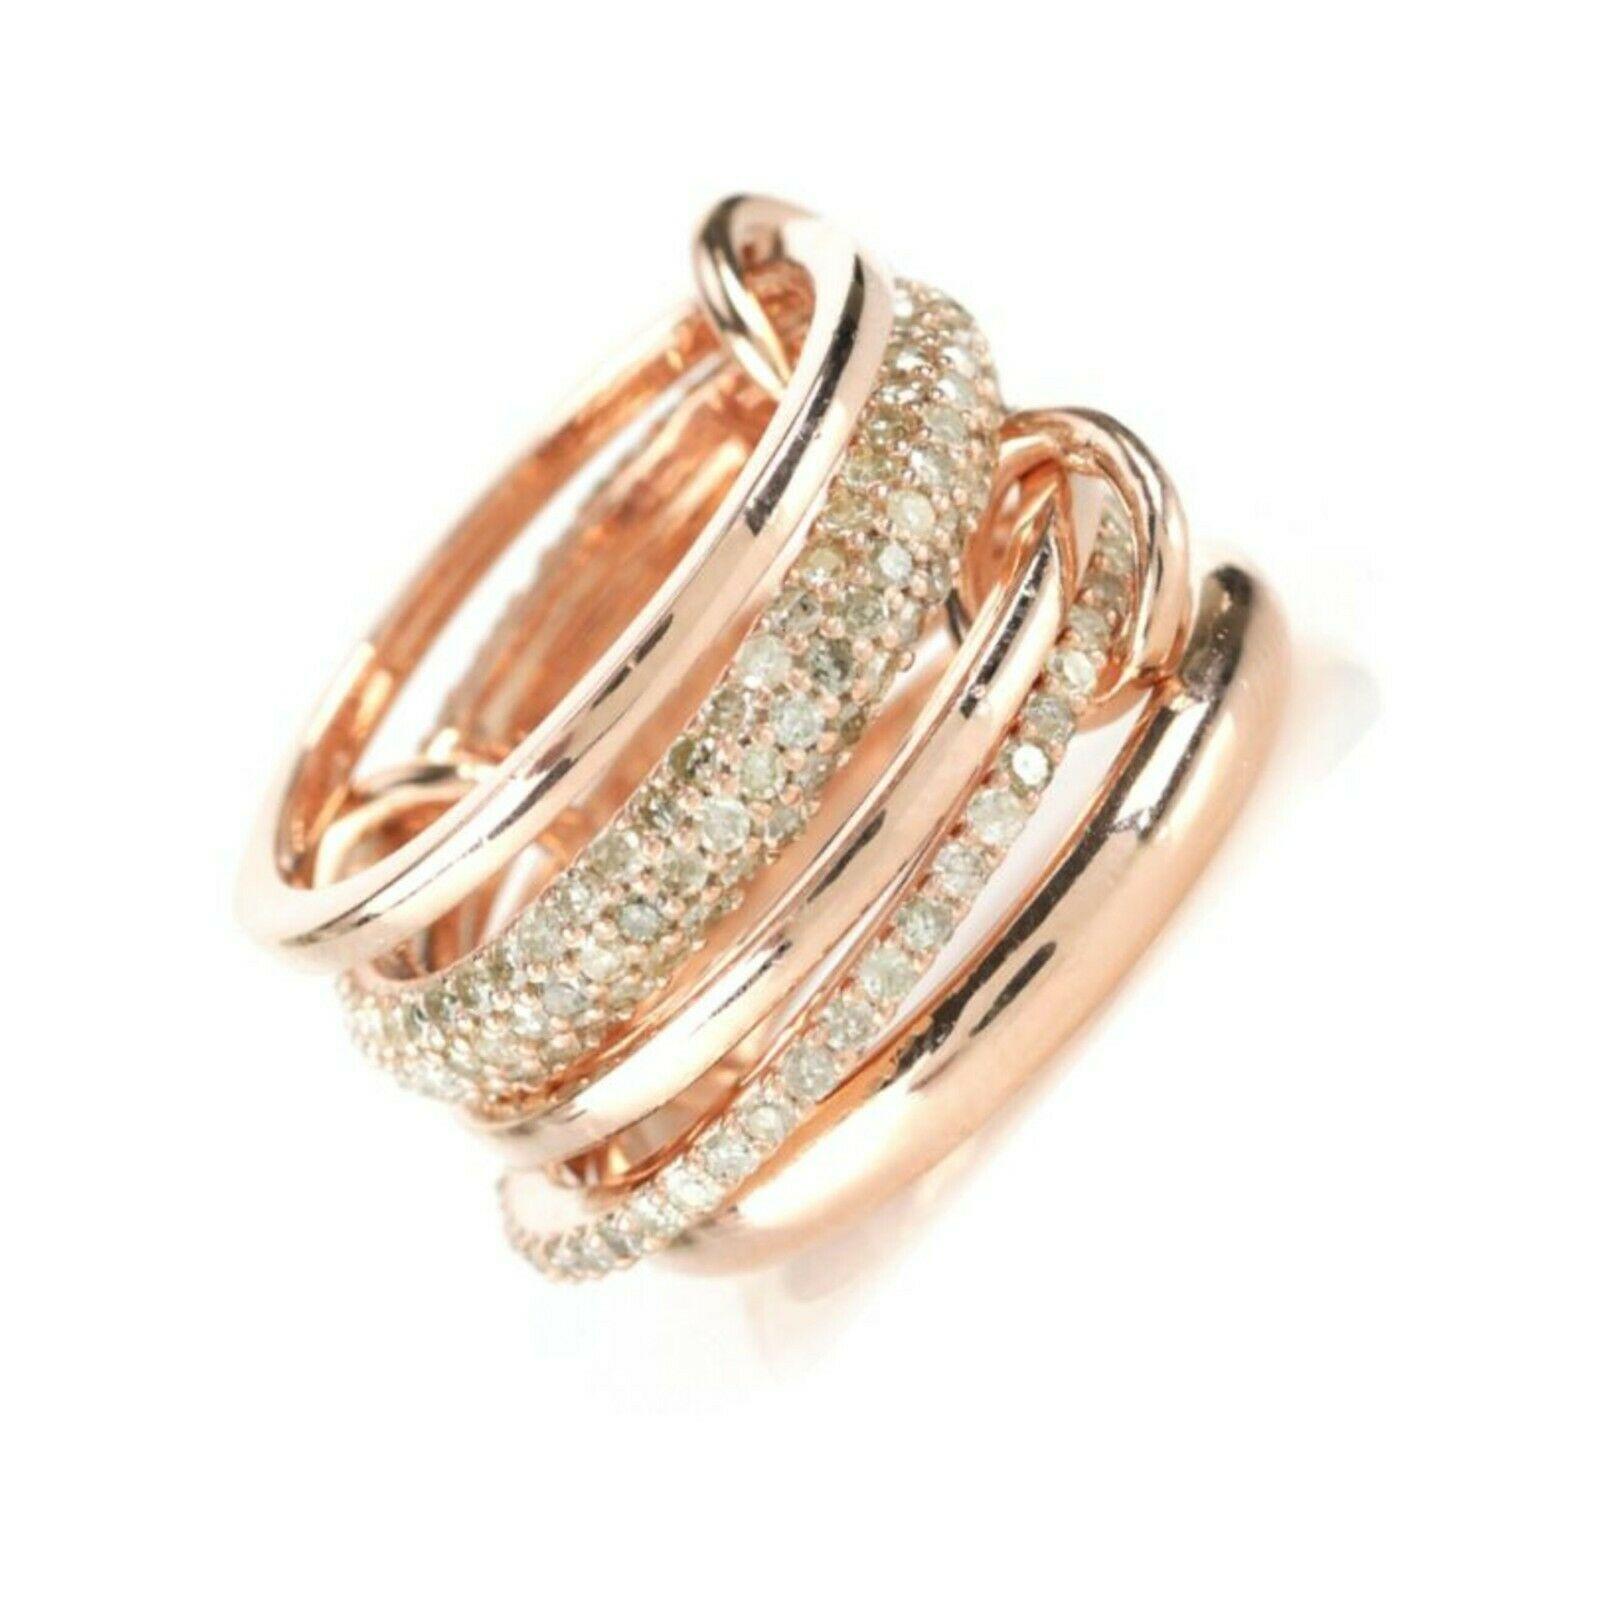 Natural Uncut Pave Diamonds 925 Sterling Silver Rings Womens Diamond Jewelry